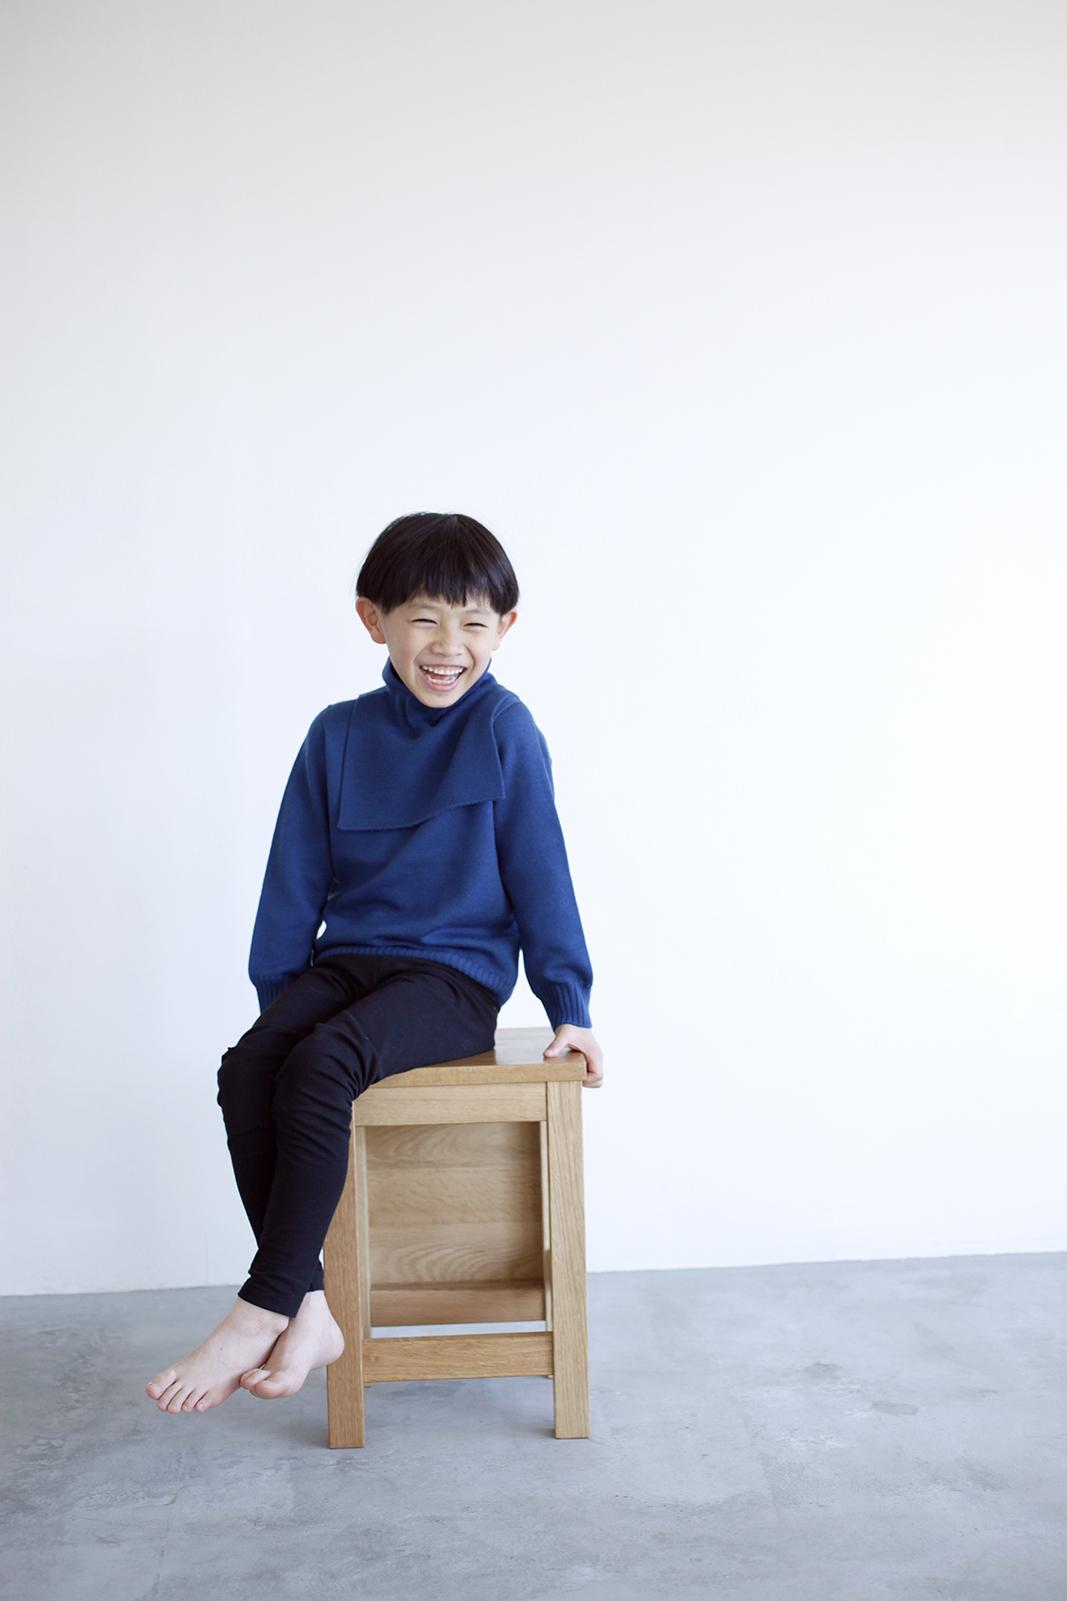 Camphor カンフル kids こども 子供服 familysweater neckwarmer 日本製 madeinjapan